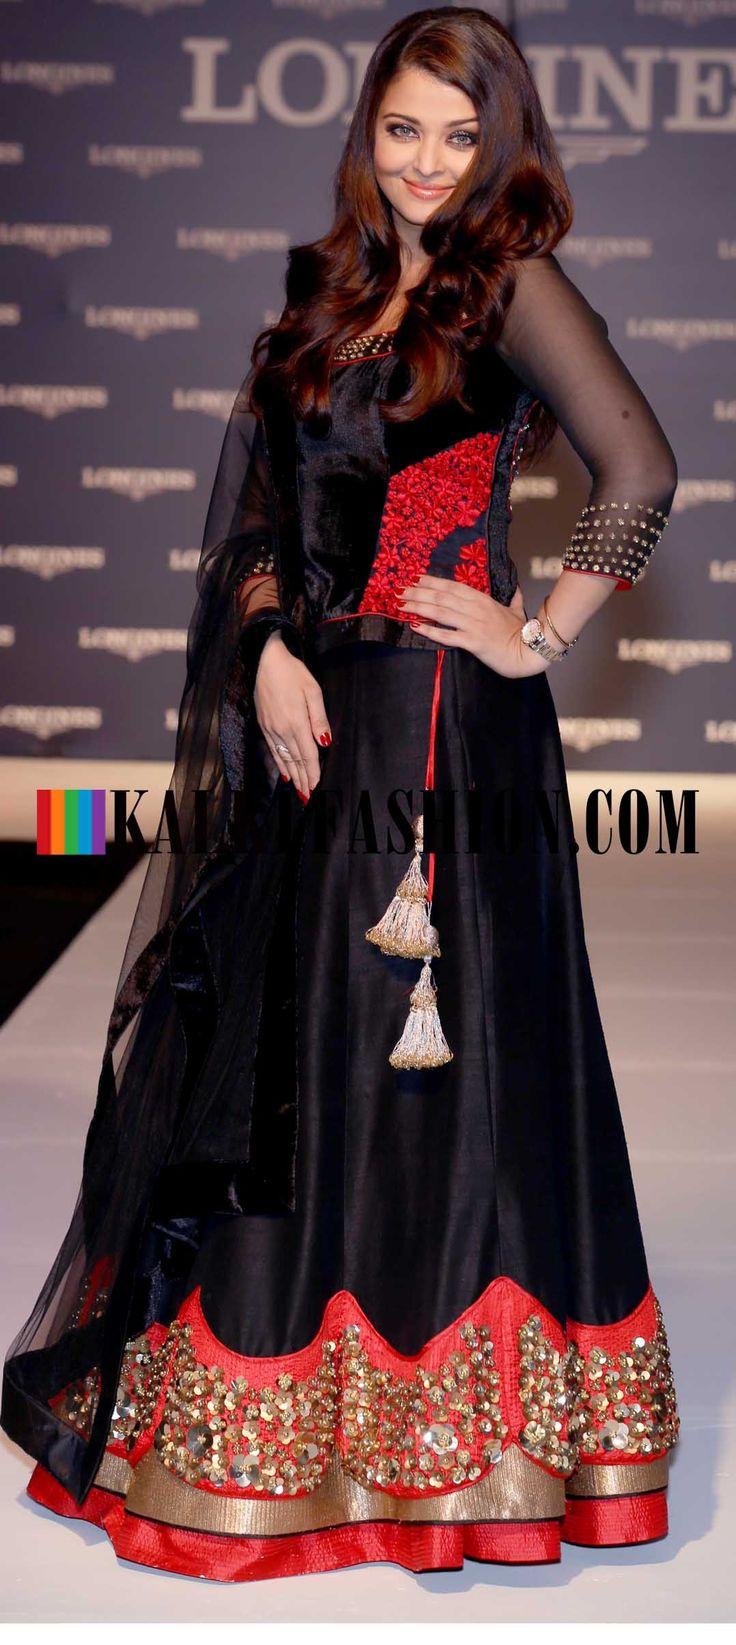 http://www.kalkifashion.com/  Aishwariya Rai in beautiful black designer lehenga by Monica and Karishma at Longiness watch in India Compaign .